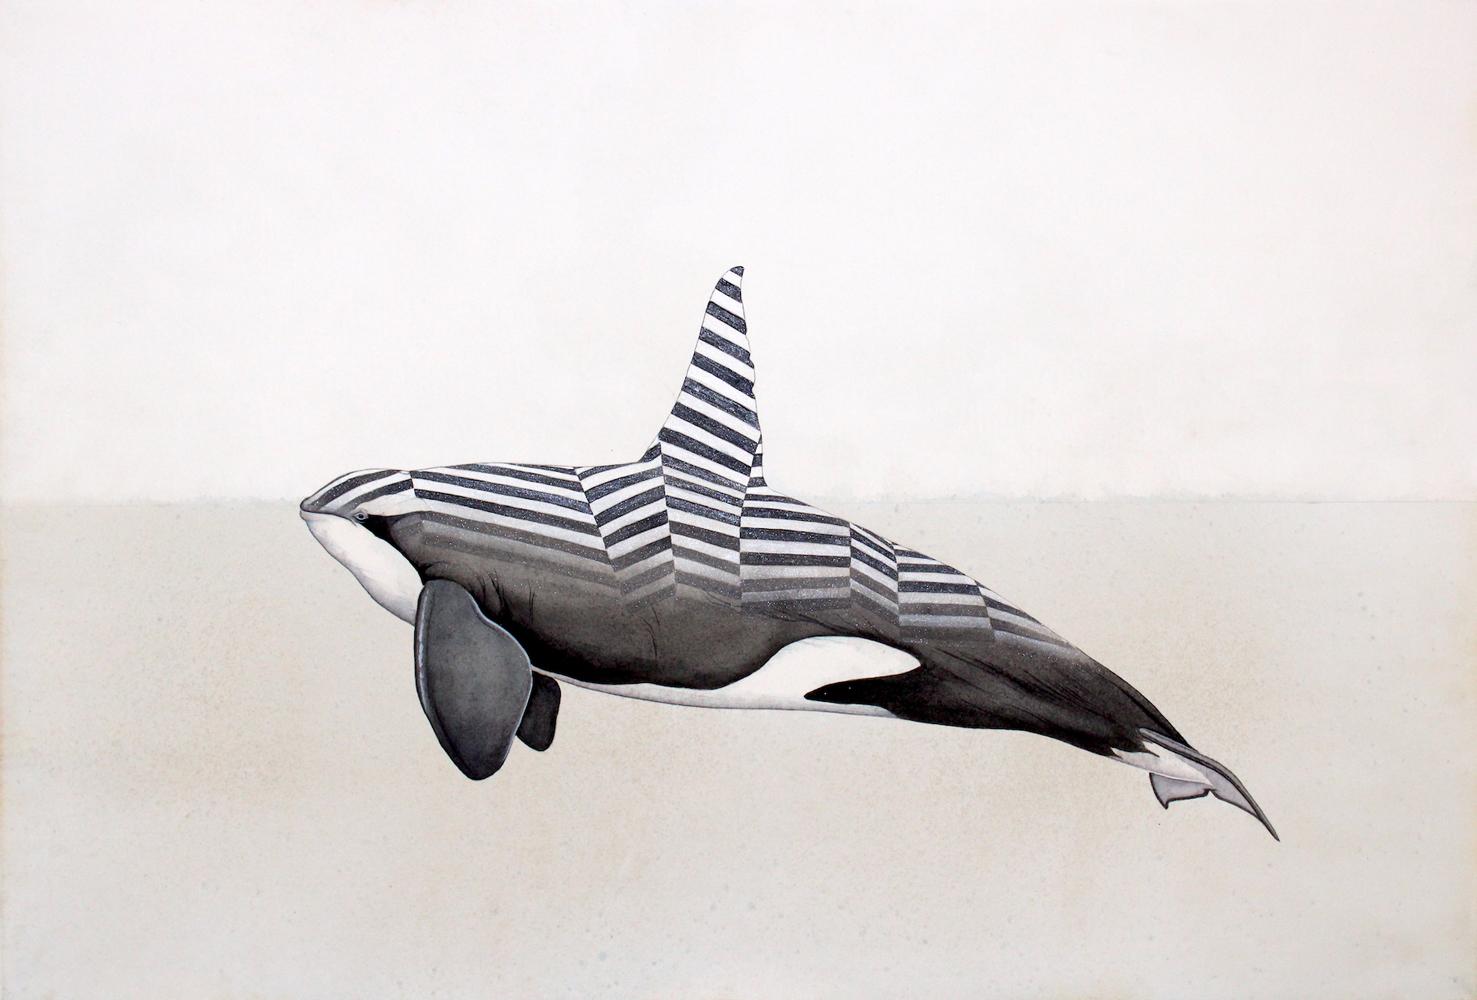 Justin Gibbens, Razzle Dazzle, 2020, watercolor, ink, acrylicon paper, 15 x 22, $1800.